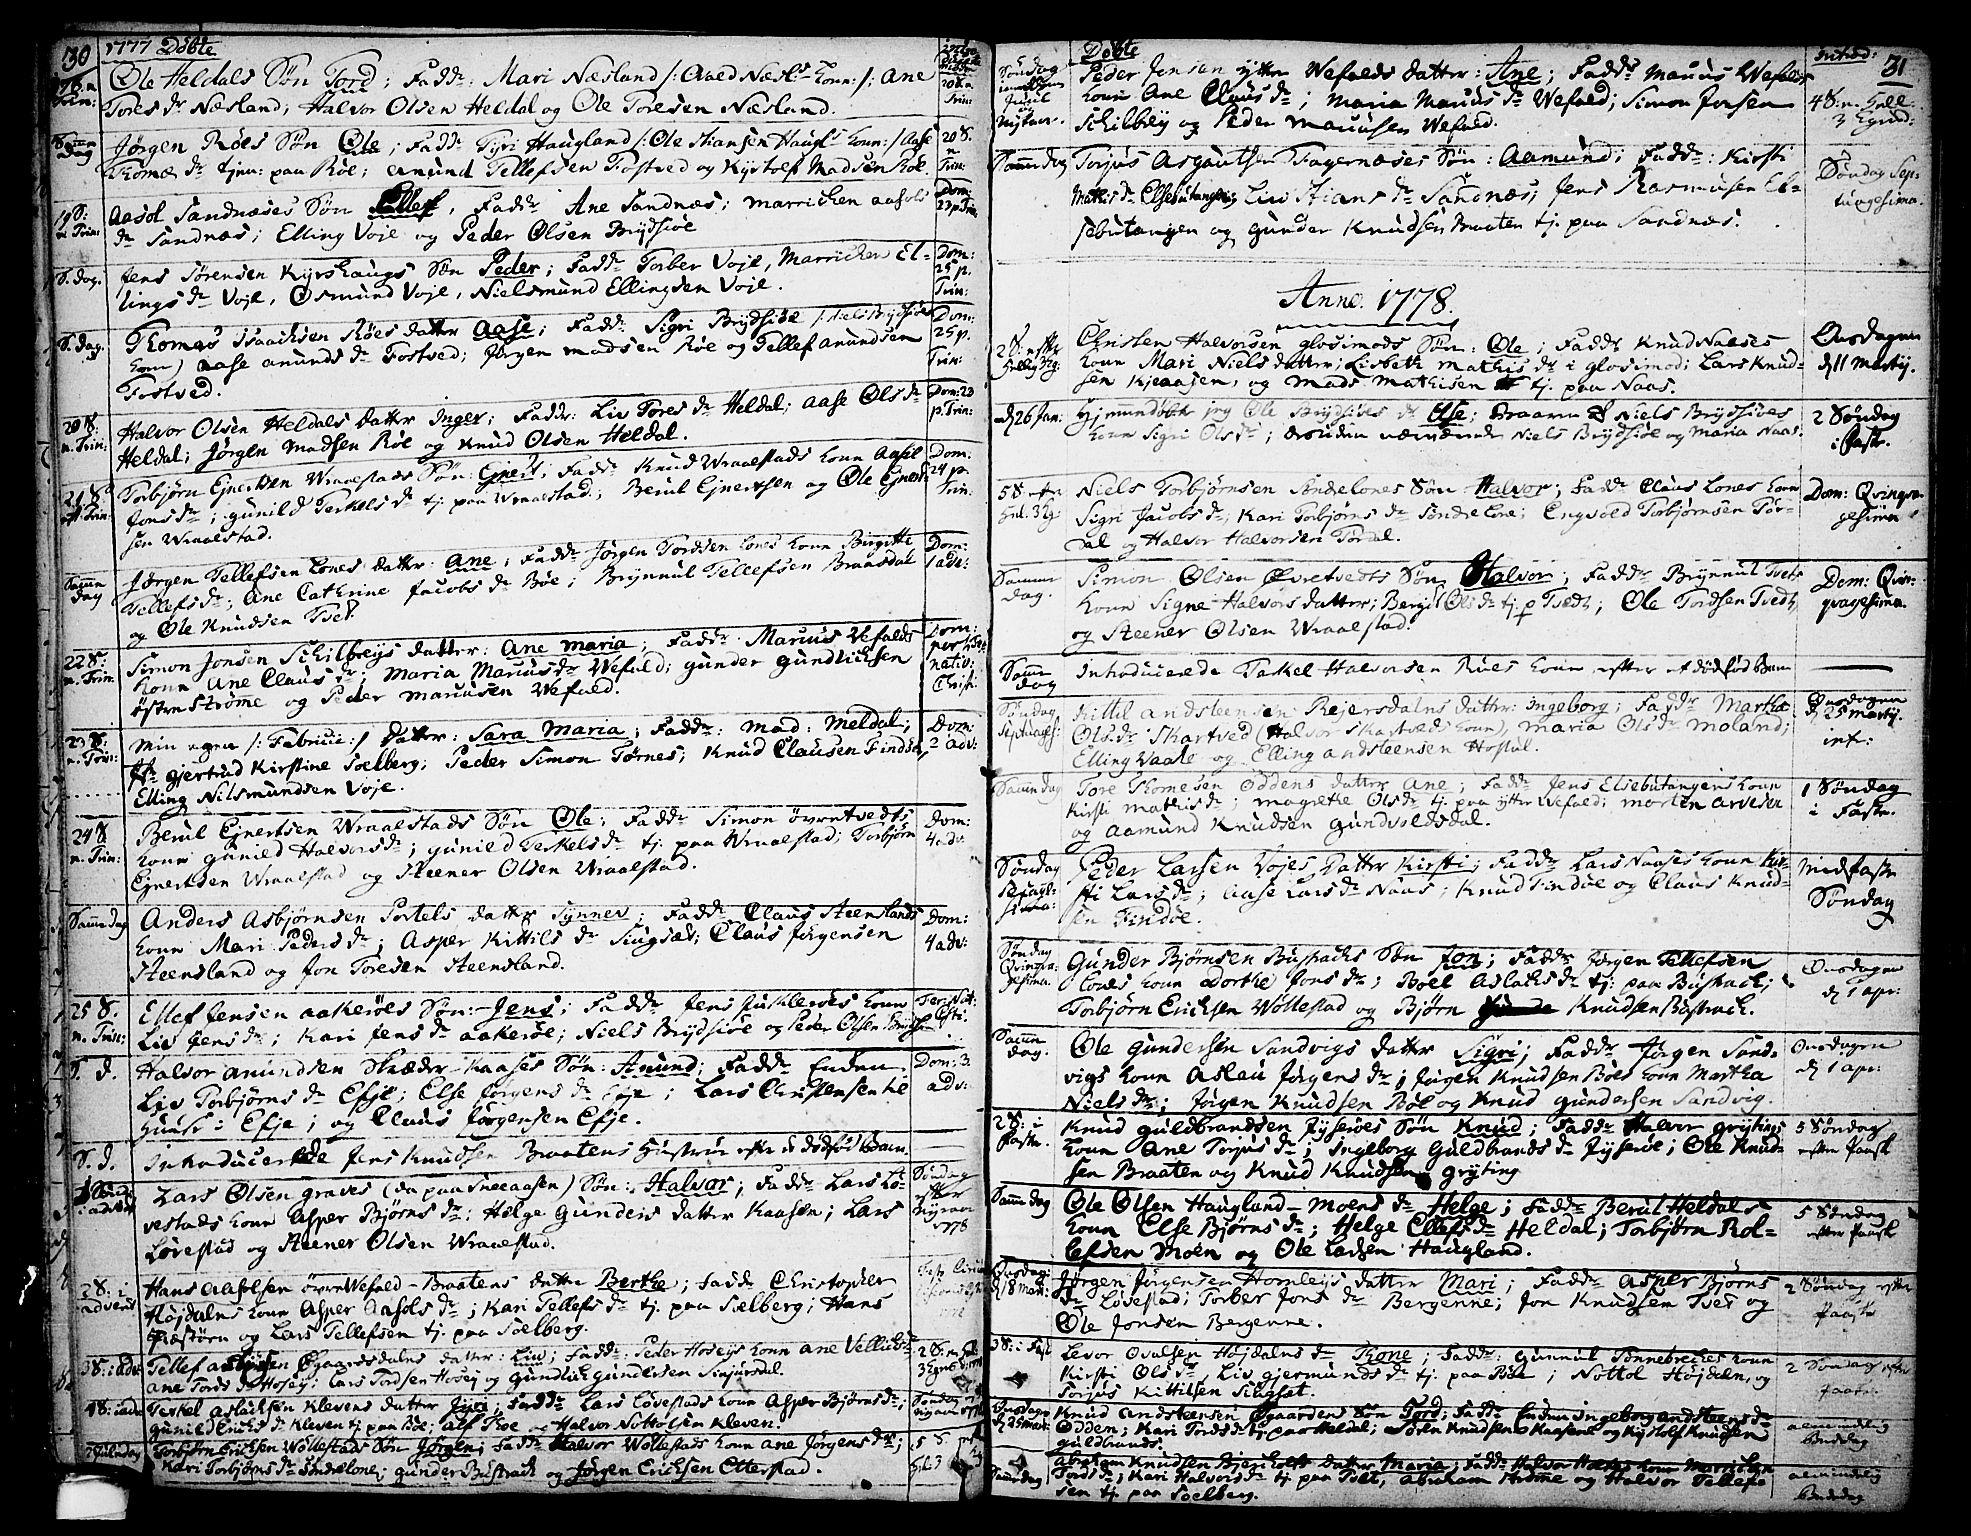 SAKO, Drangedal kirkebøker, F/Fa/L0003: Ministerialbok nr. 3, 1768-1814, s. 30-31